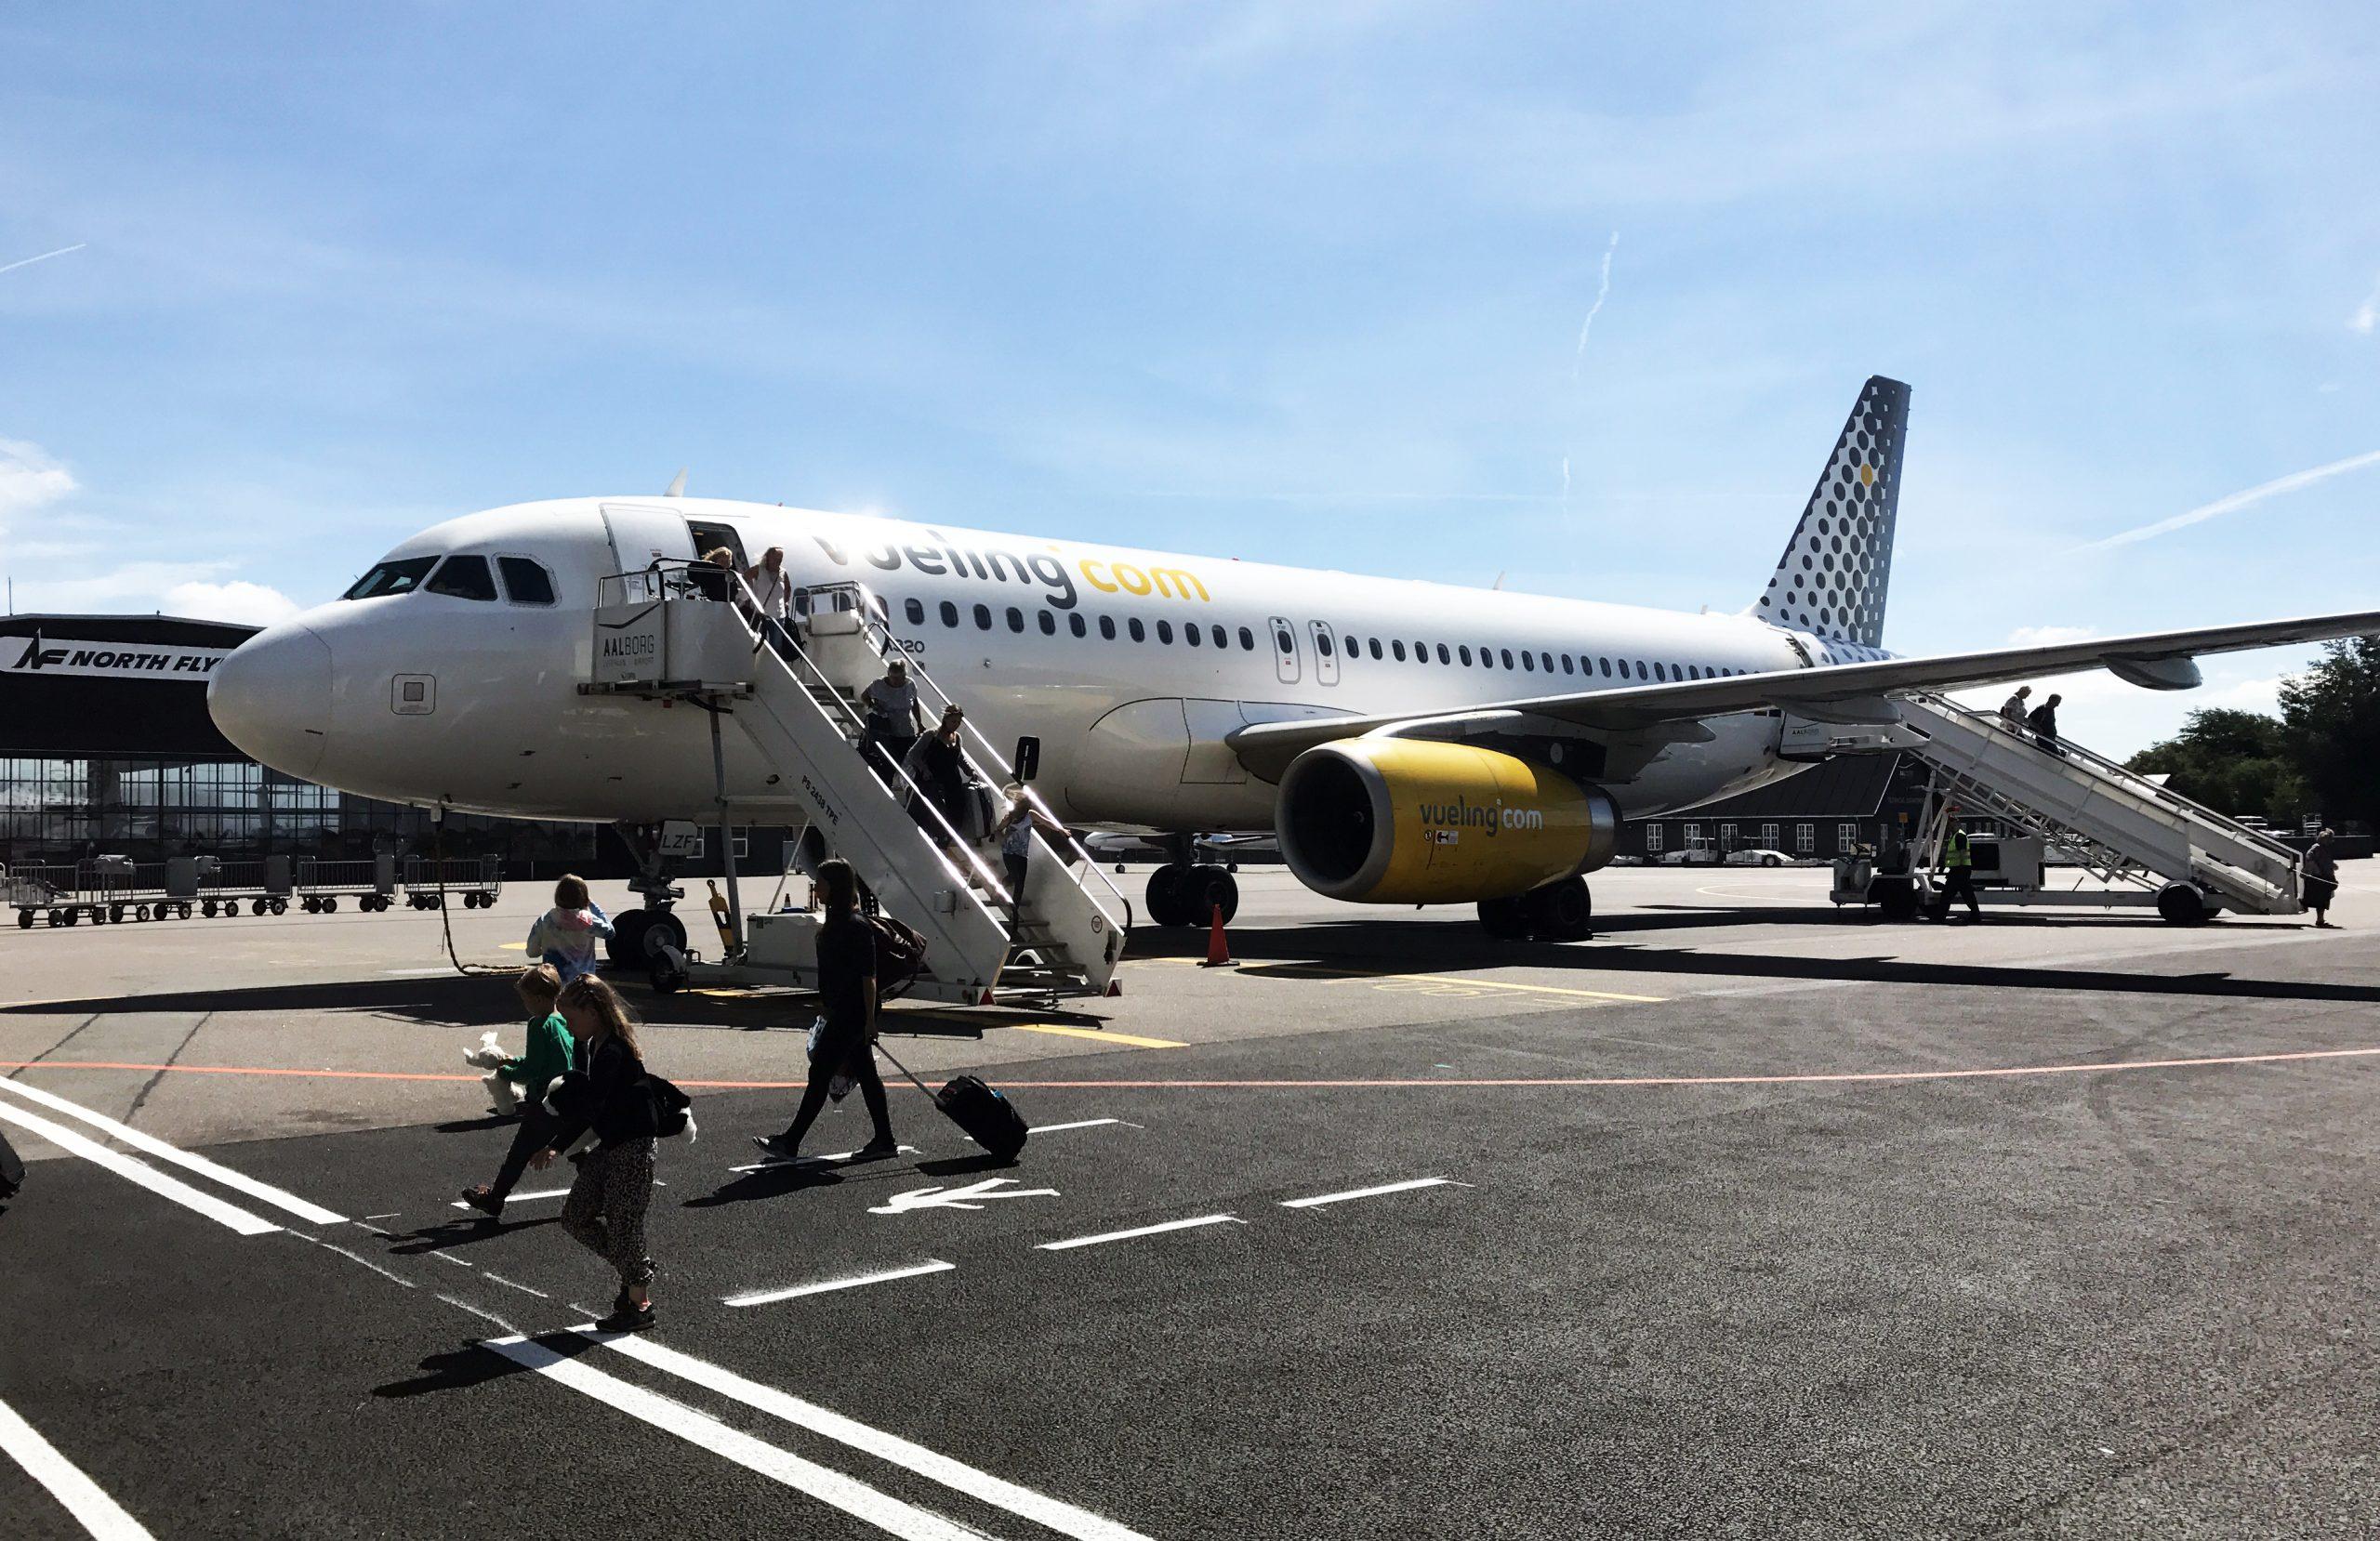 Vuelings Airbus A320 i Aalborg Lufthavn. (Foto: Joakim J. Hvistendahl)